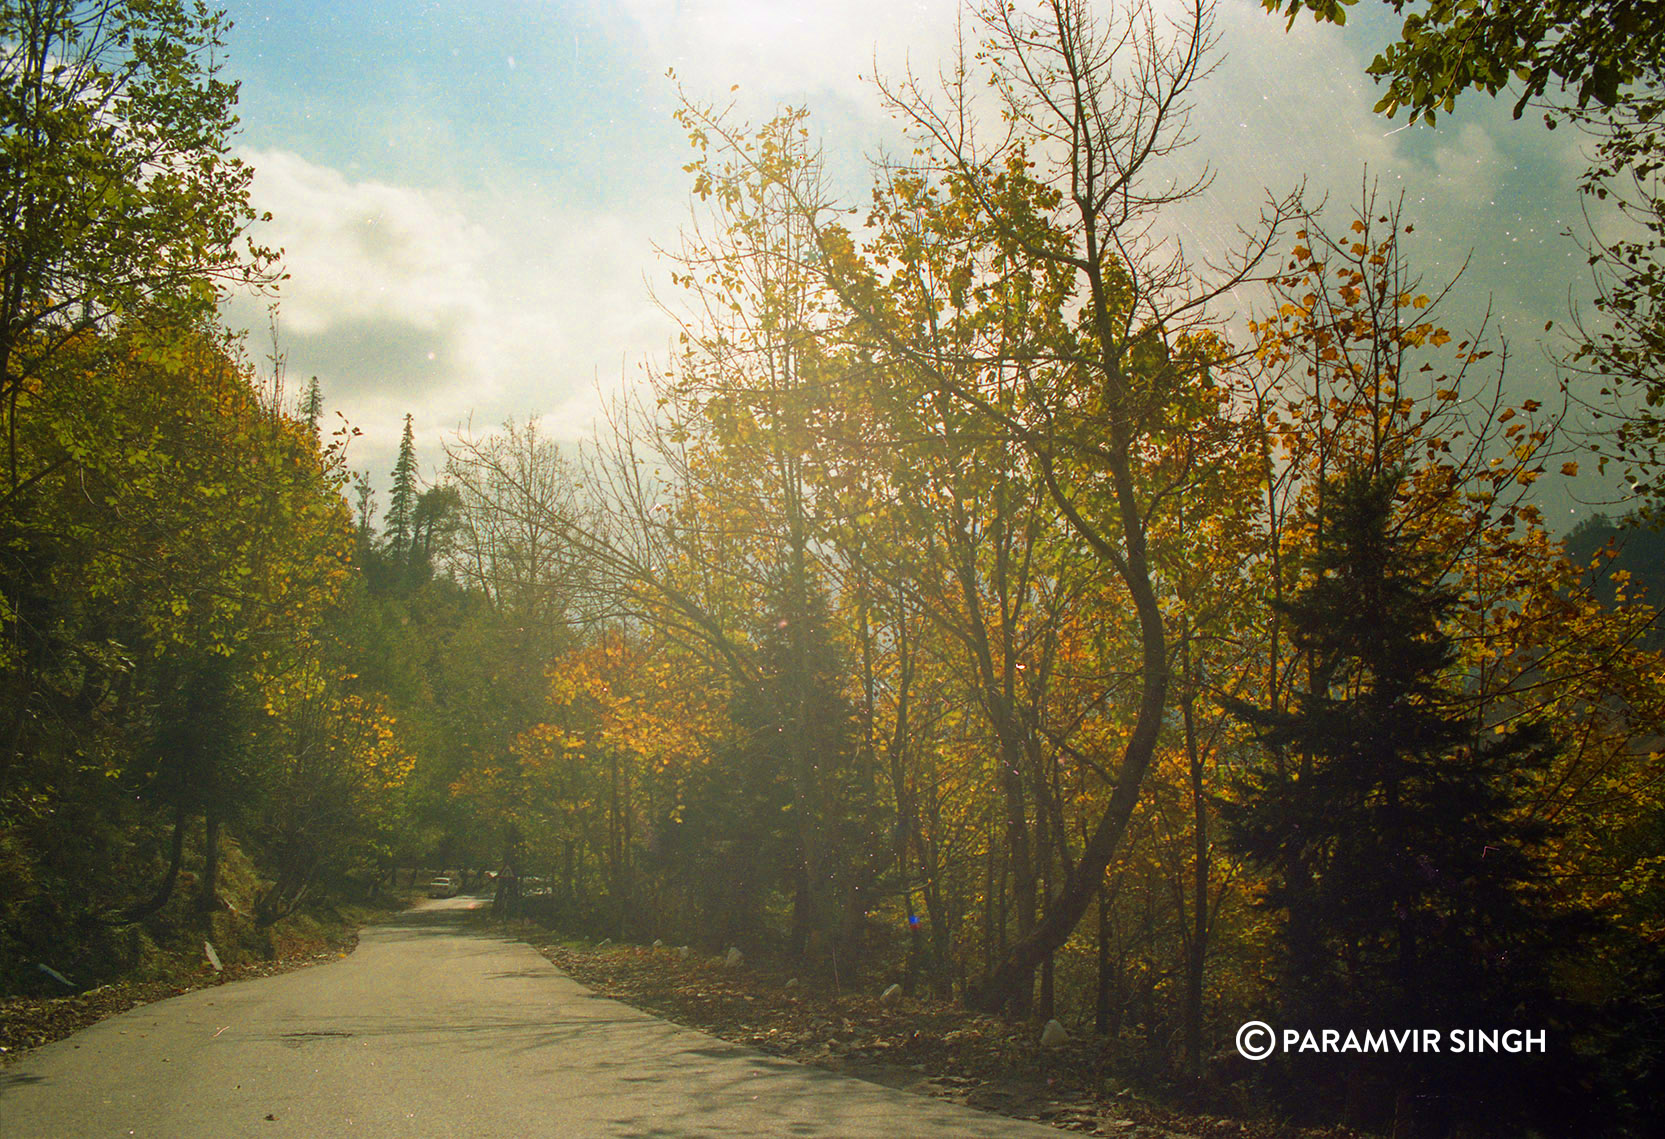 Drive tio Rohtang Pass, Manali